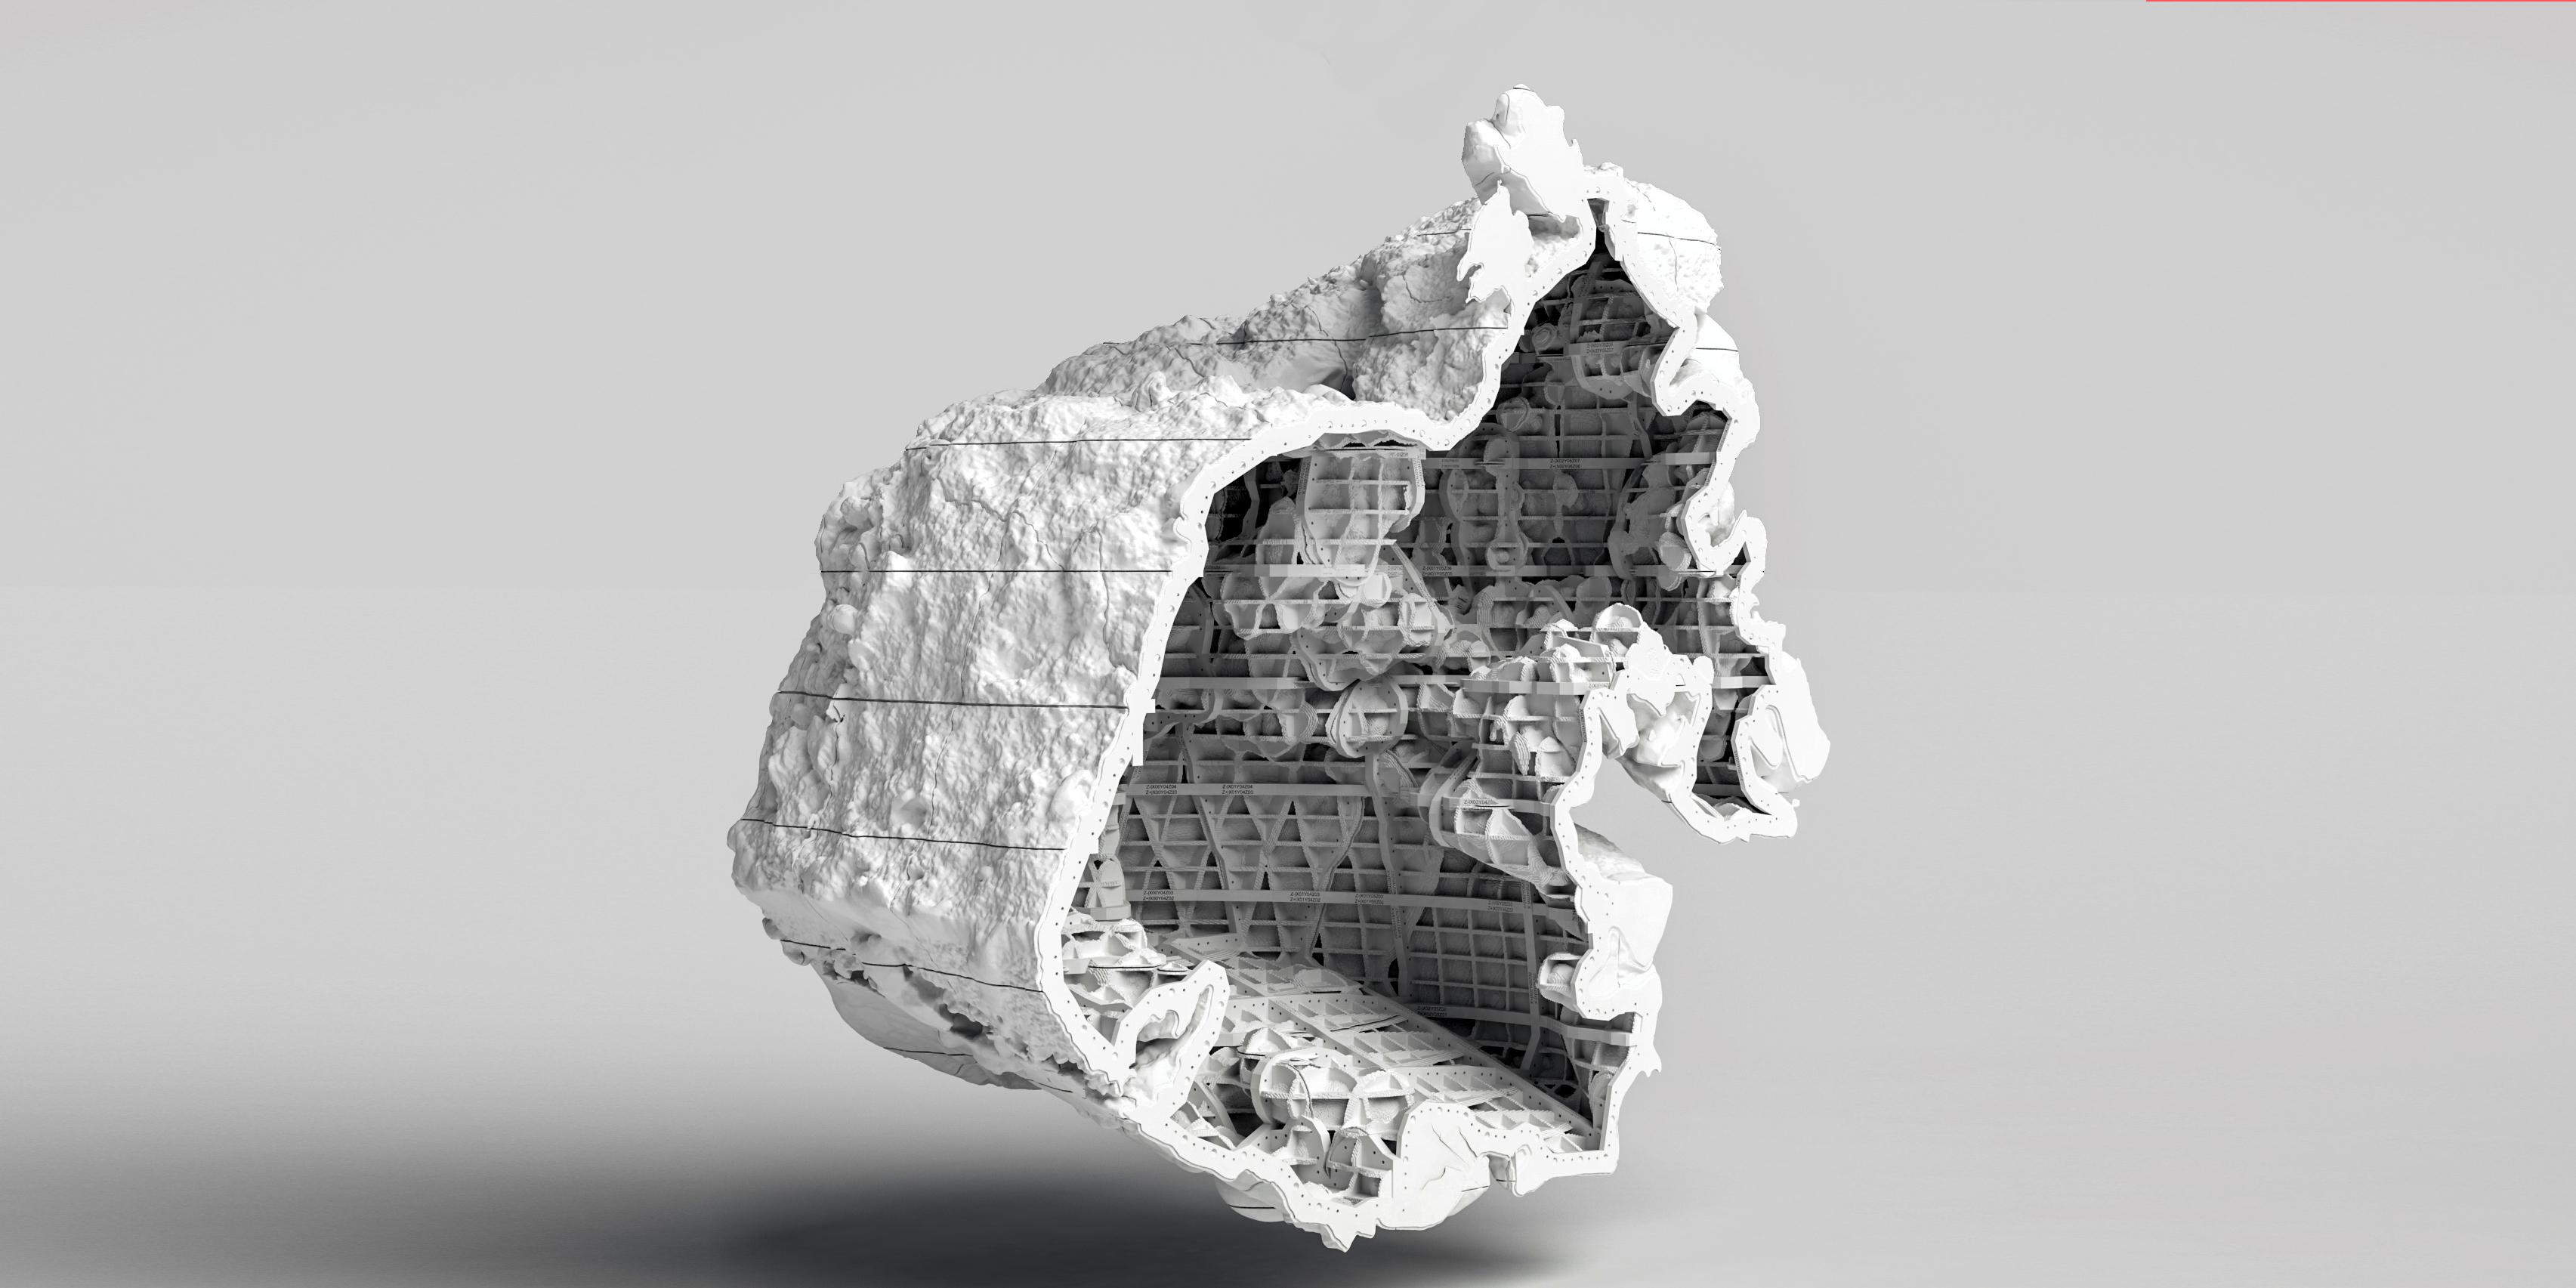 3D Printed Freeform Molds